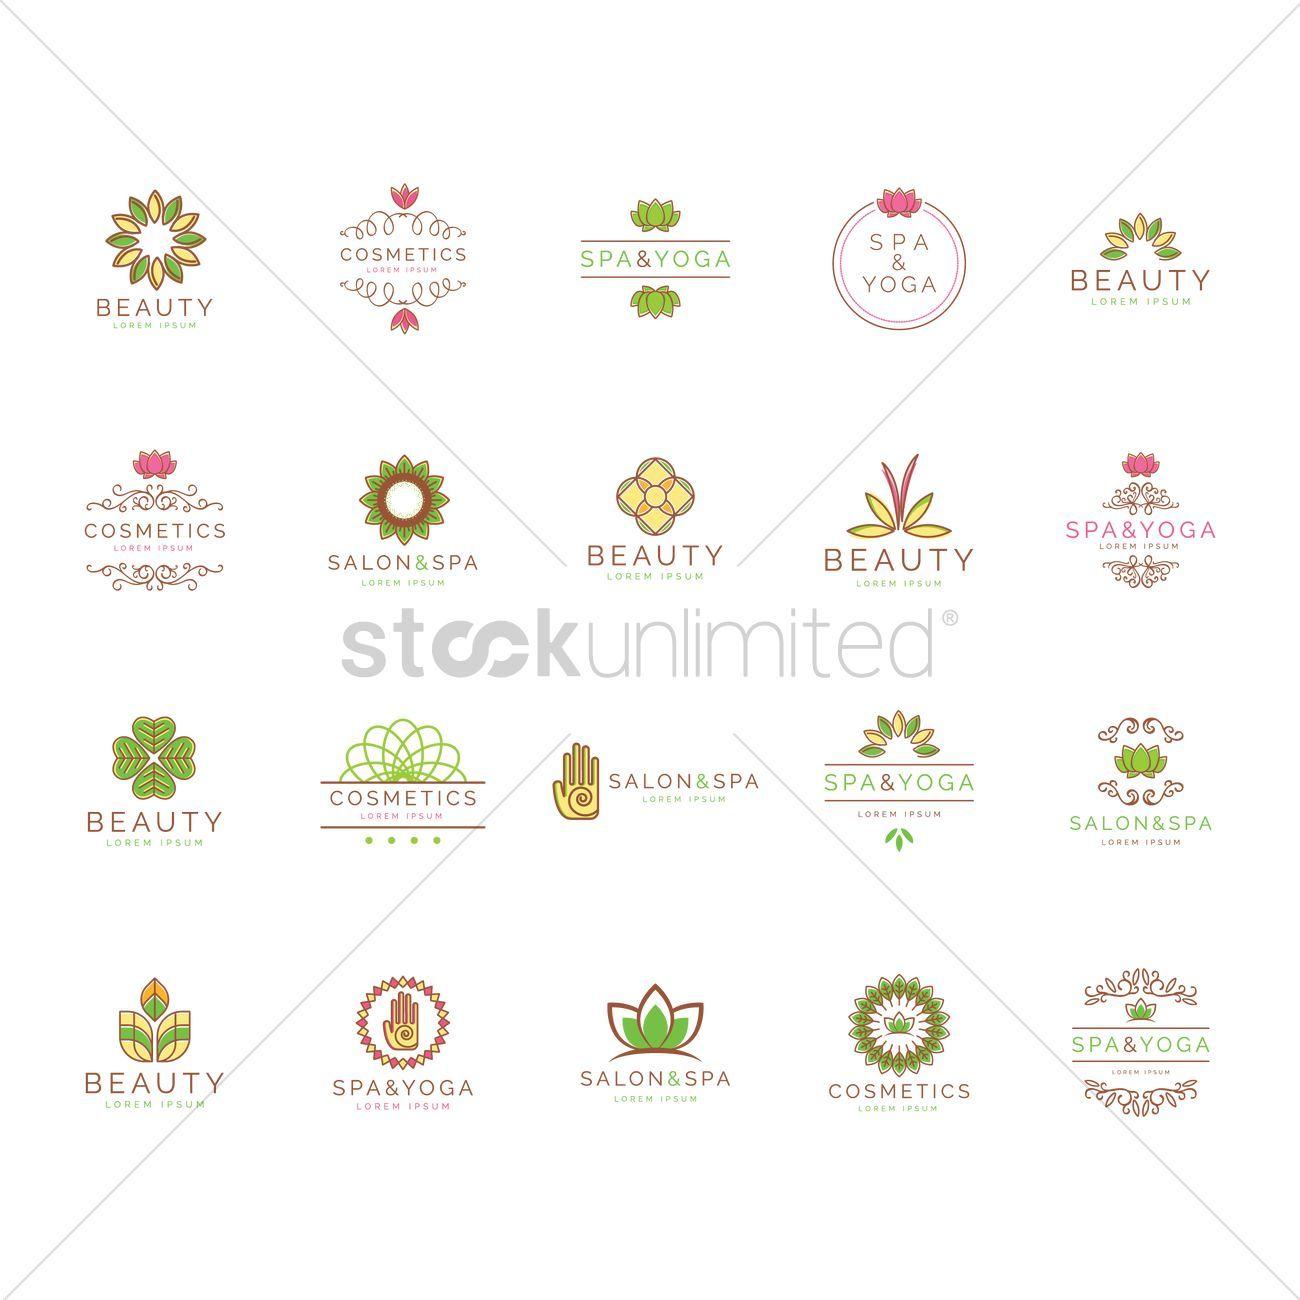 Beauty and spa logo element set vector illustration